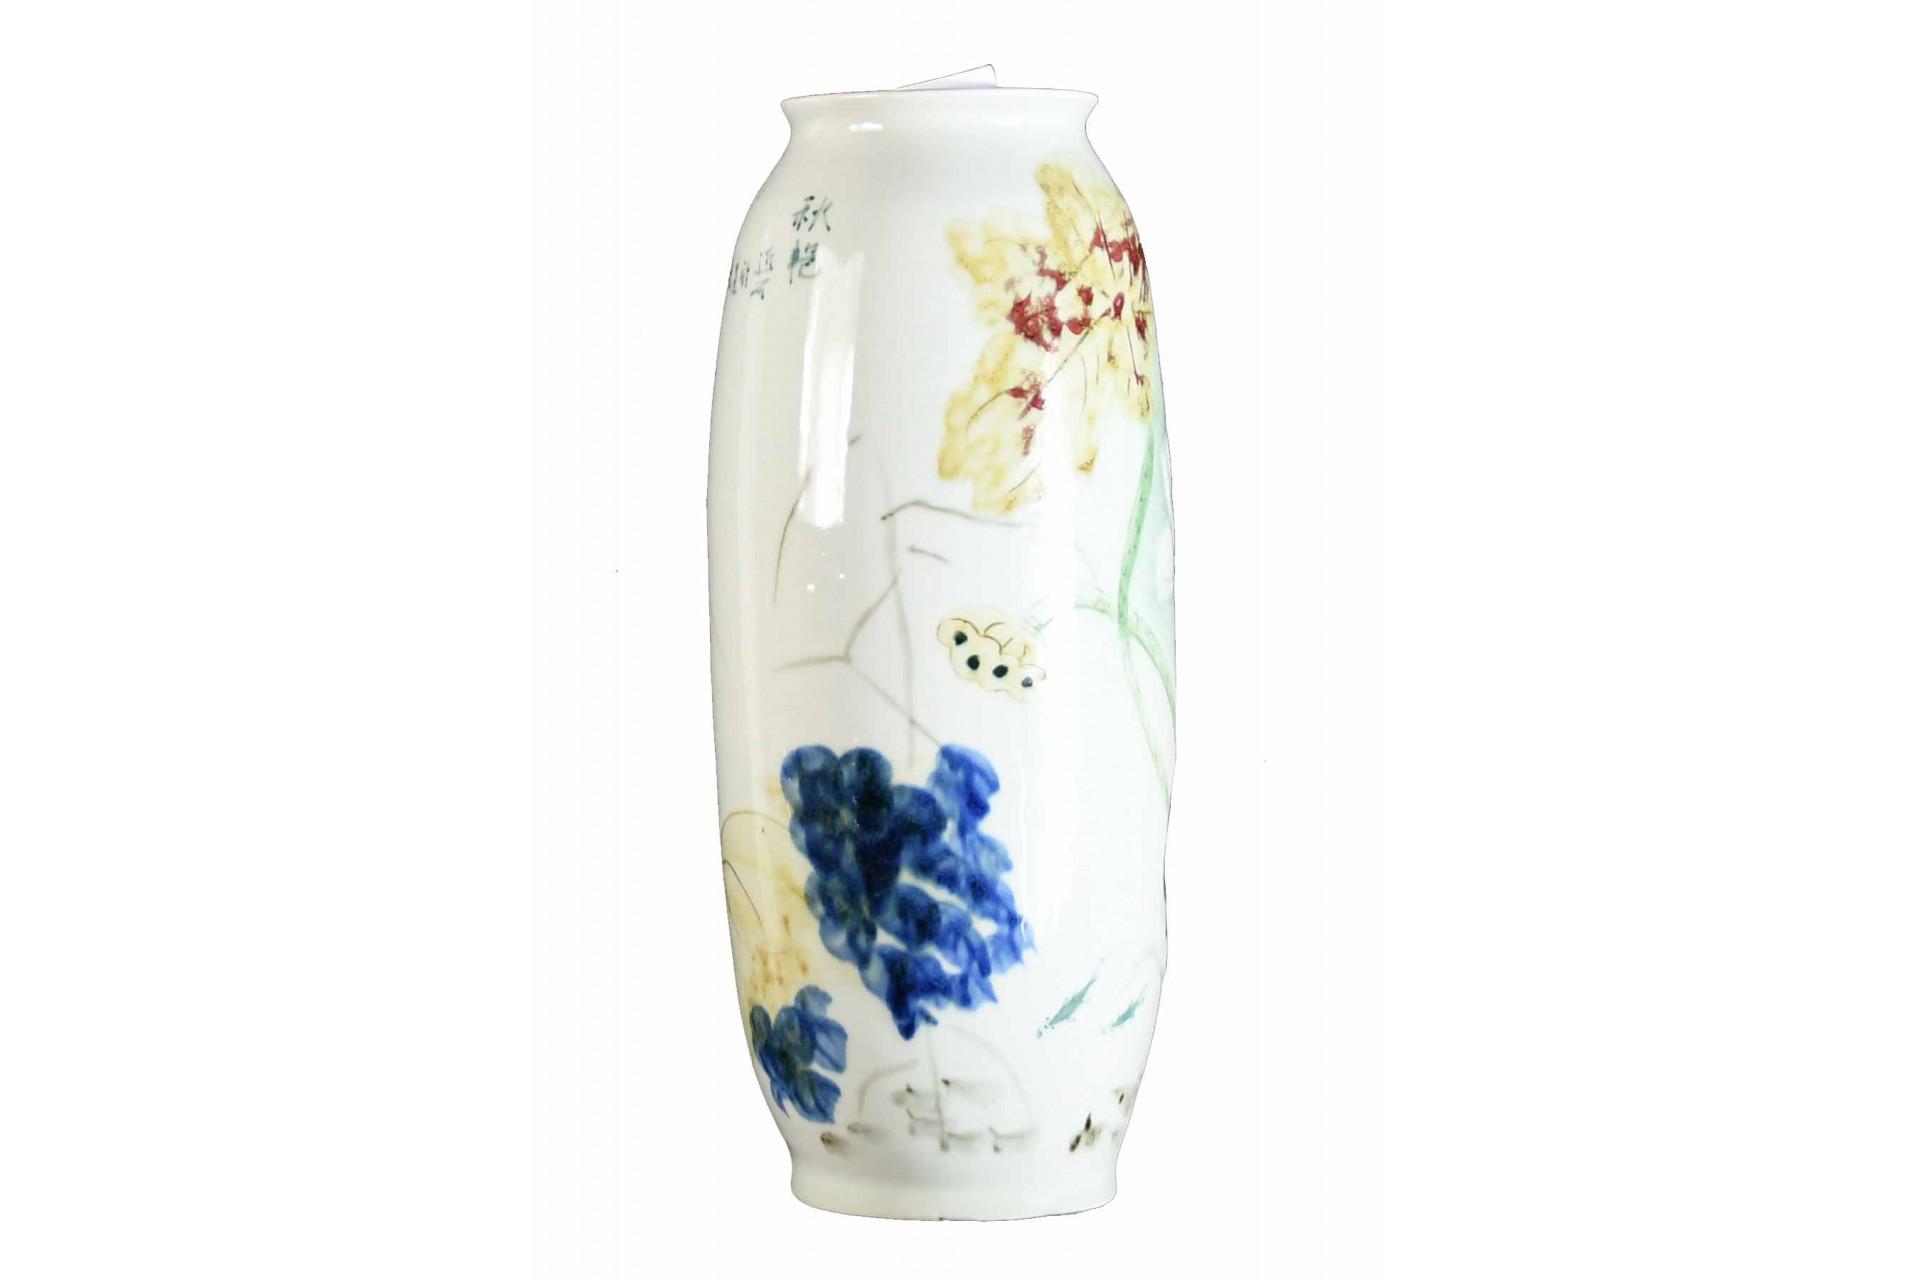 JiangXi porcelain vase